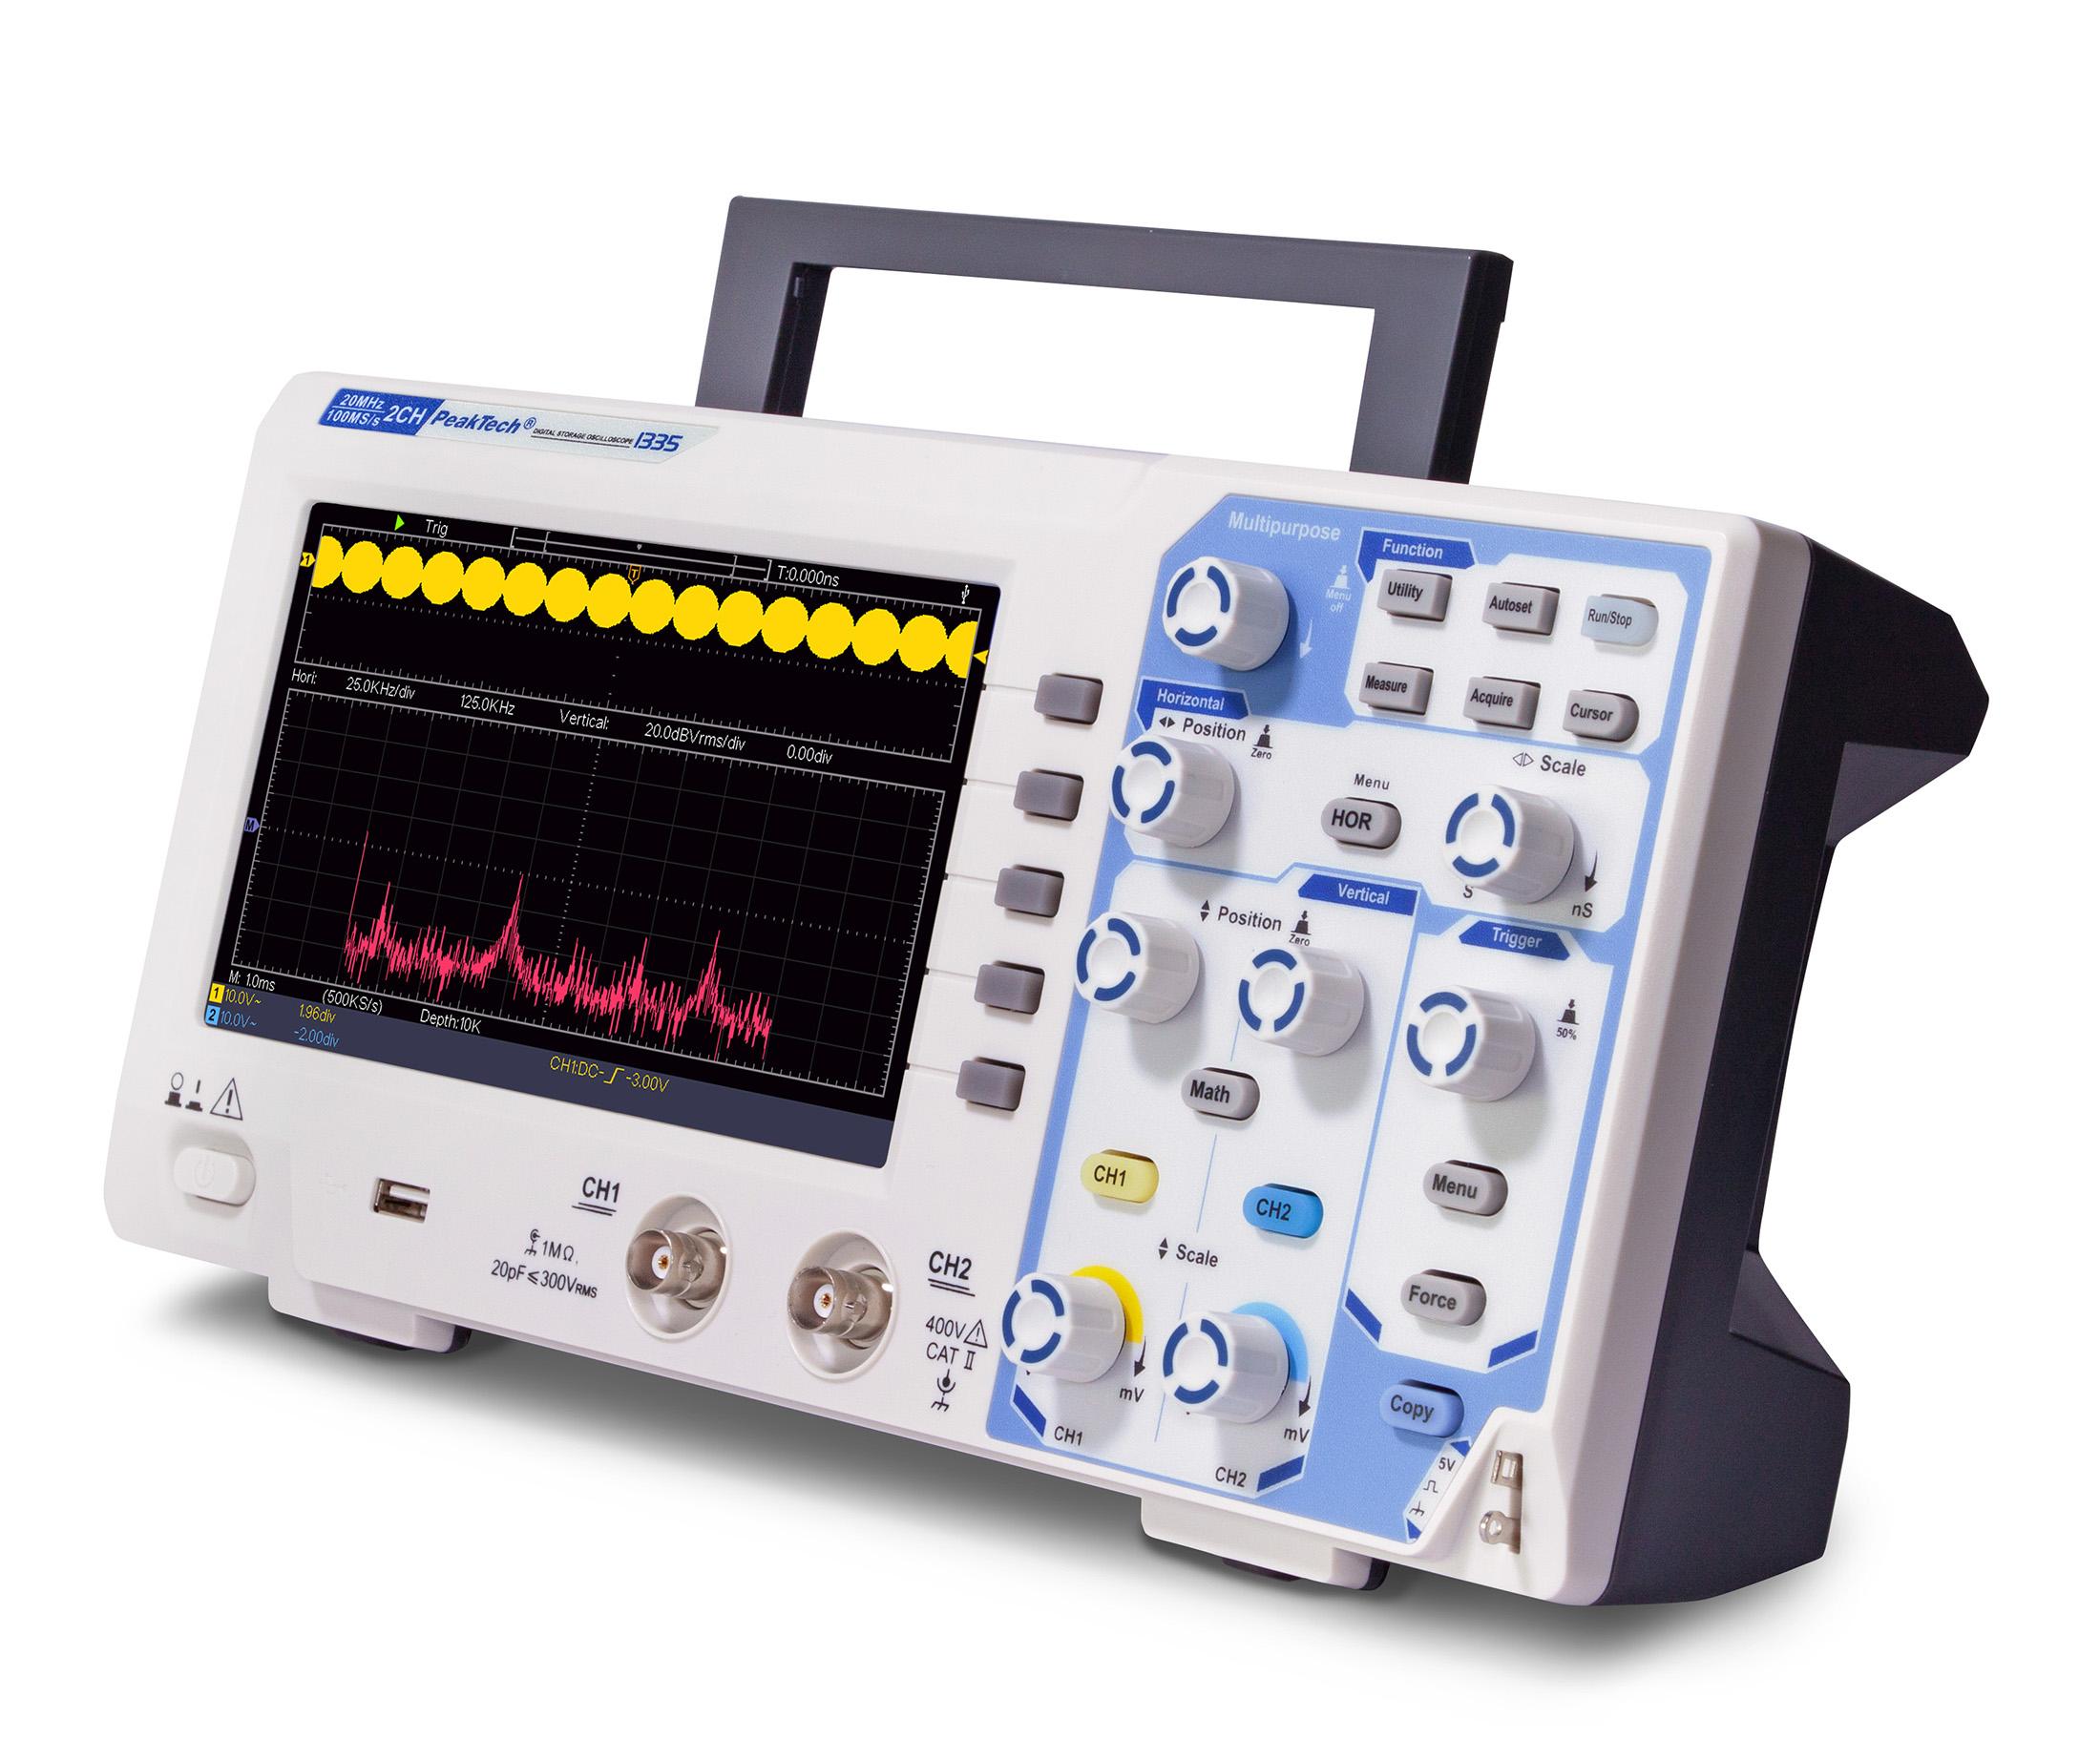 «PeakTech® P 1335» 20 MHz/2 CH, 100 MS/s digital storage oscilloscope